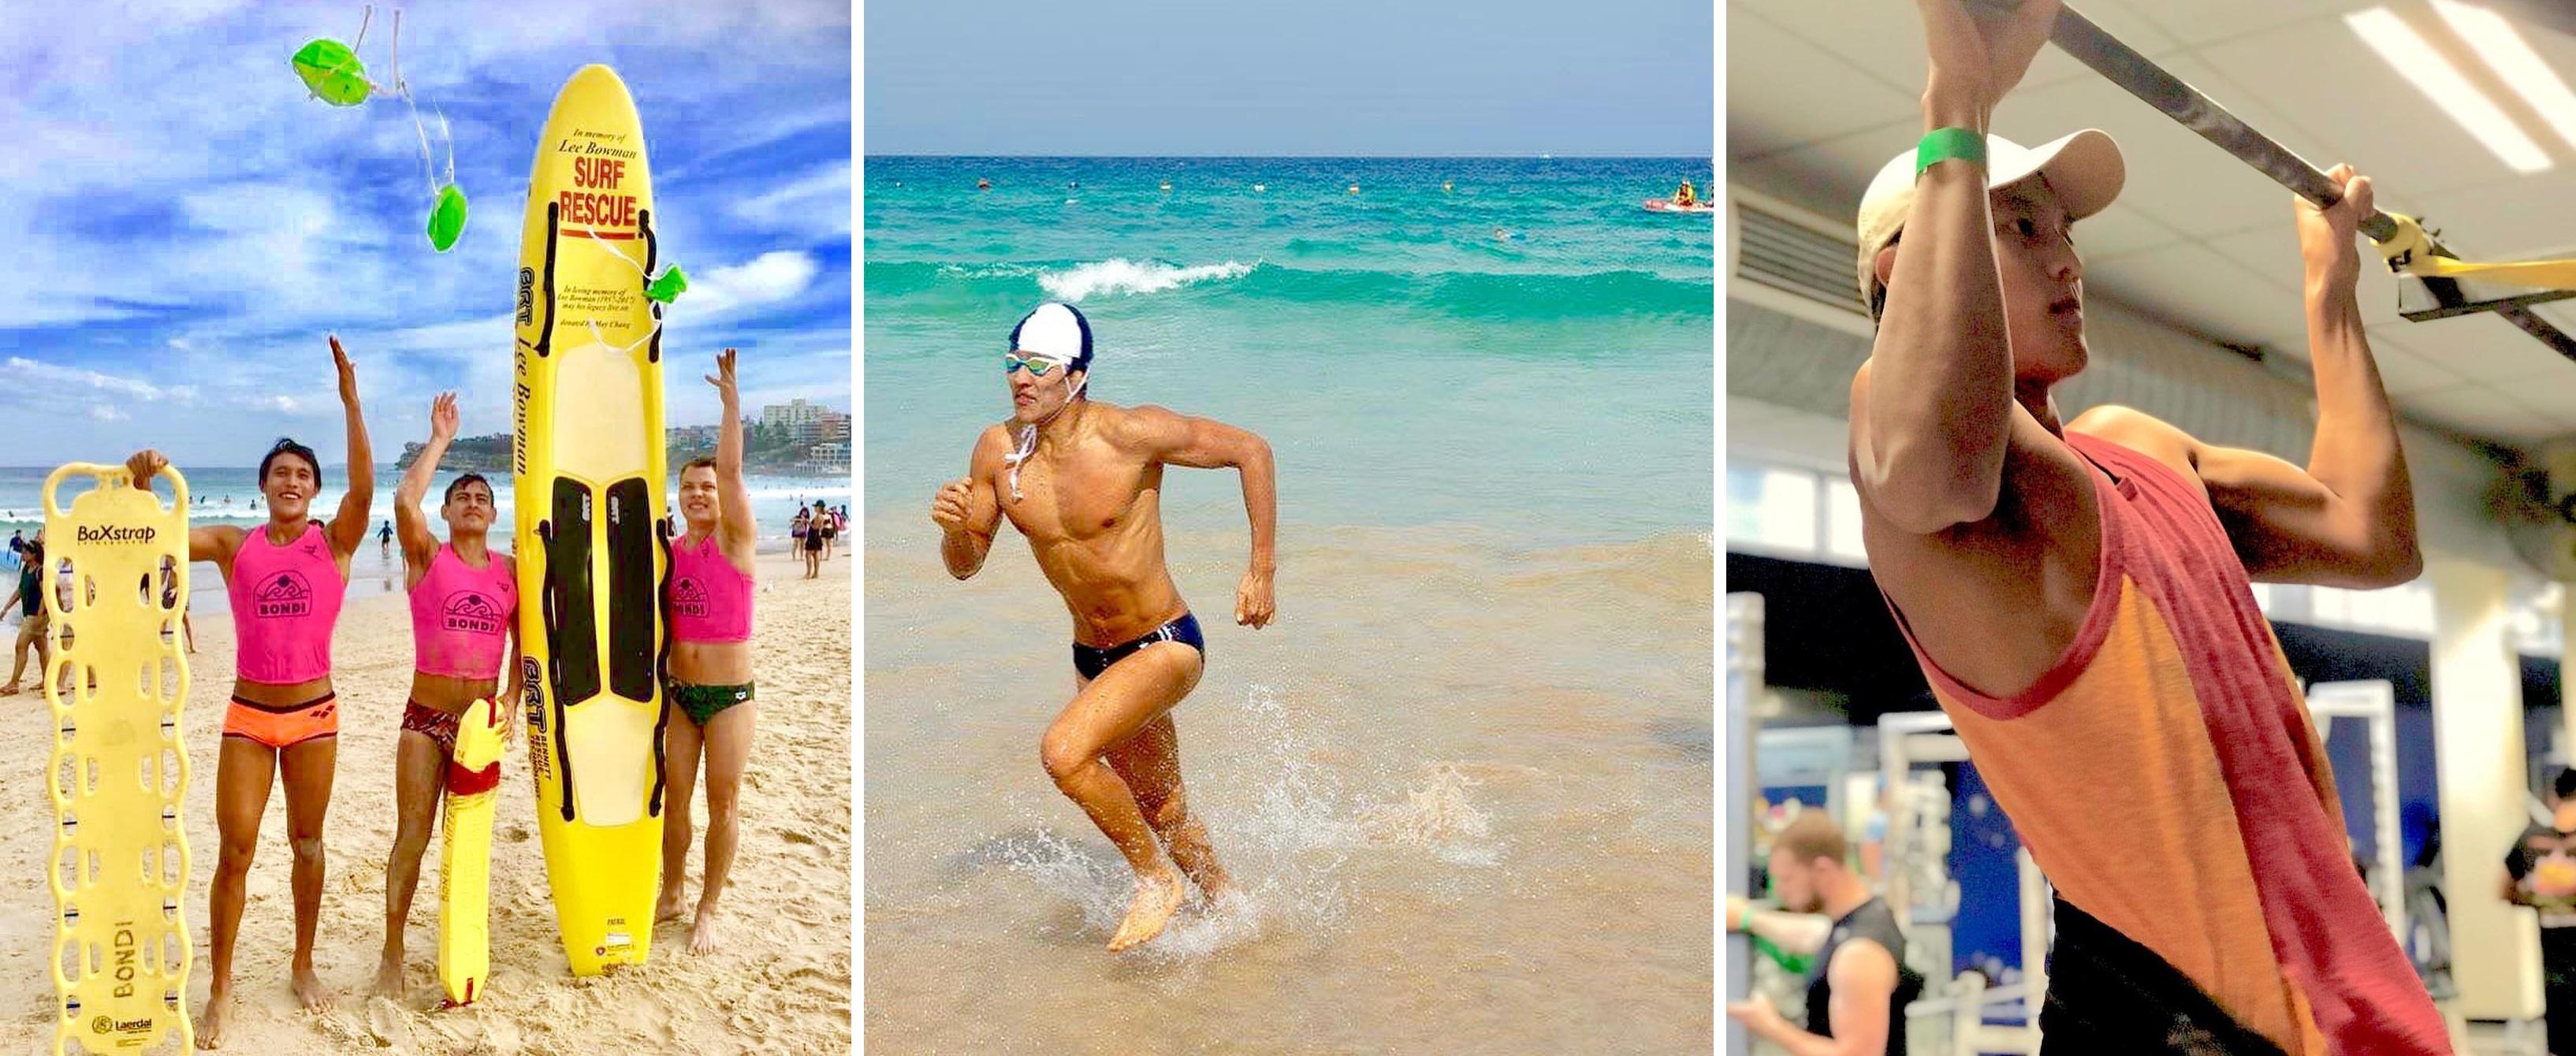 Xiang考取悉尼著名沙灘Bondi Beach的衝浪救援員資格。